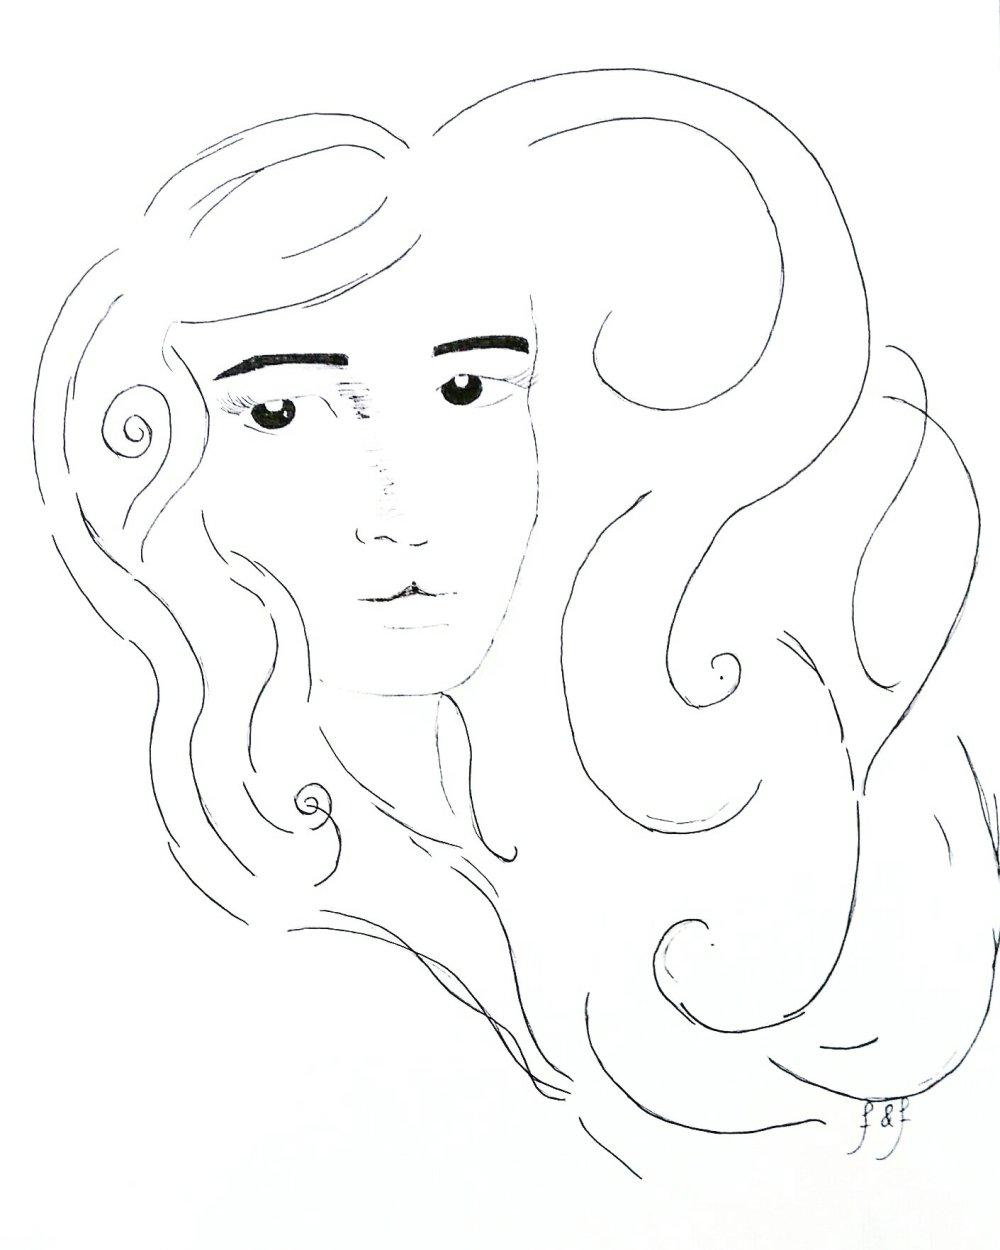 Illustration, art, drawing, self-portrait, fairytales & fireflies